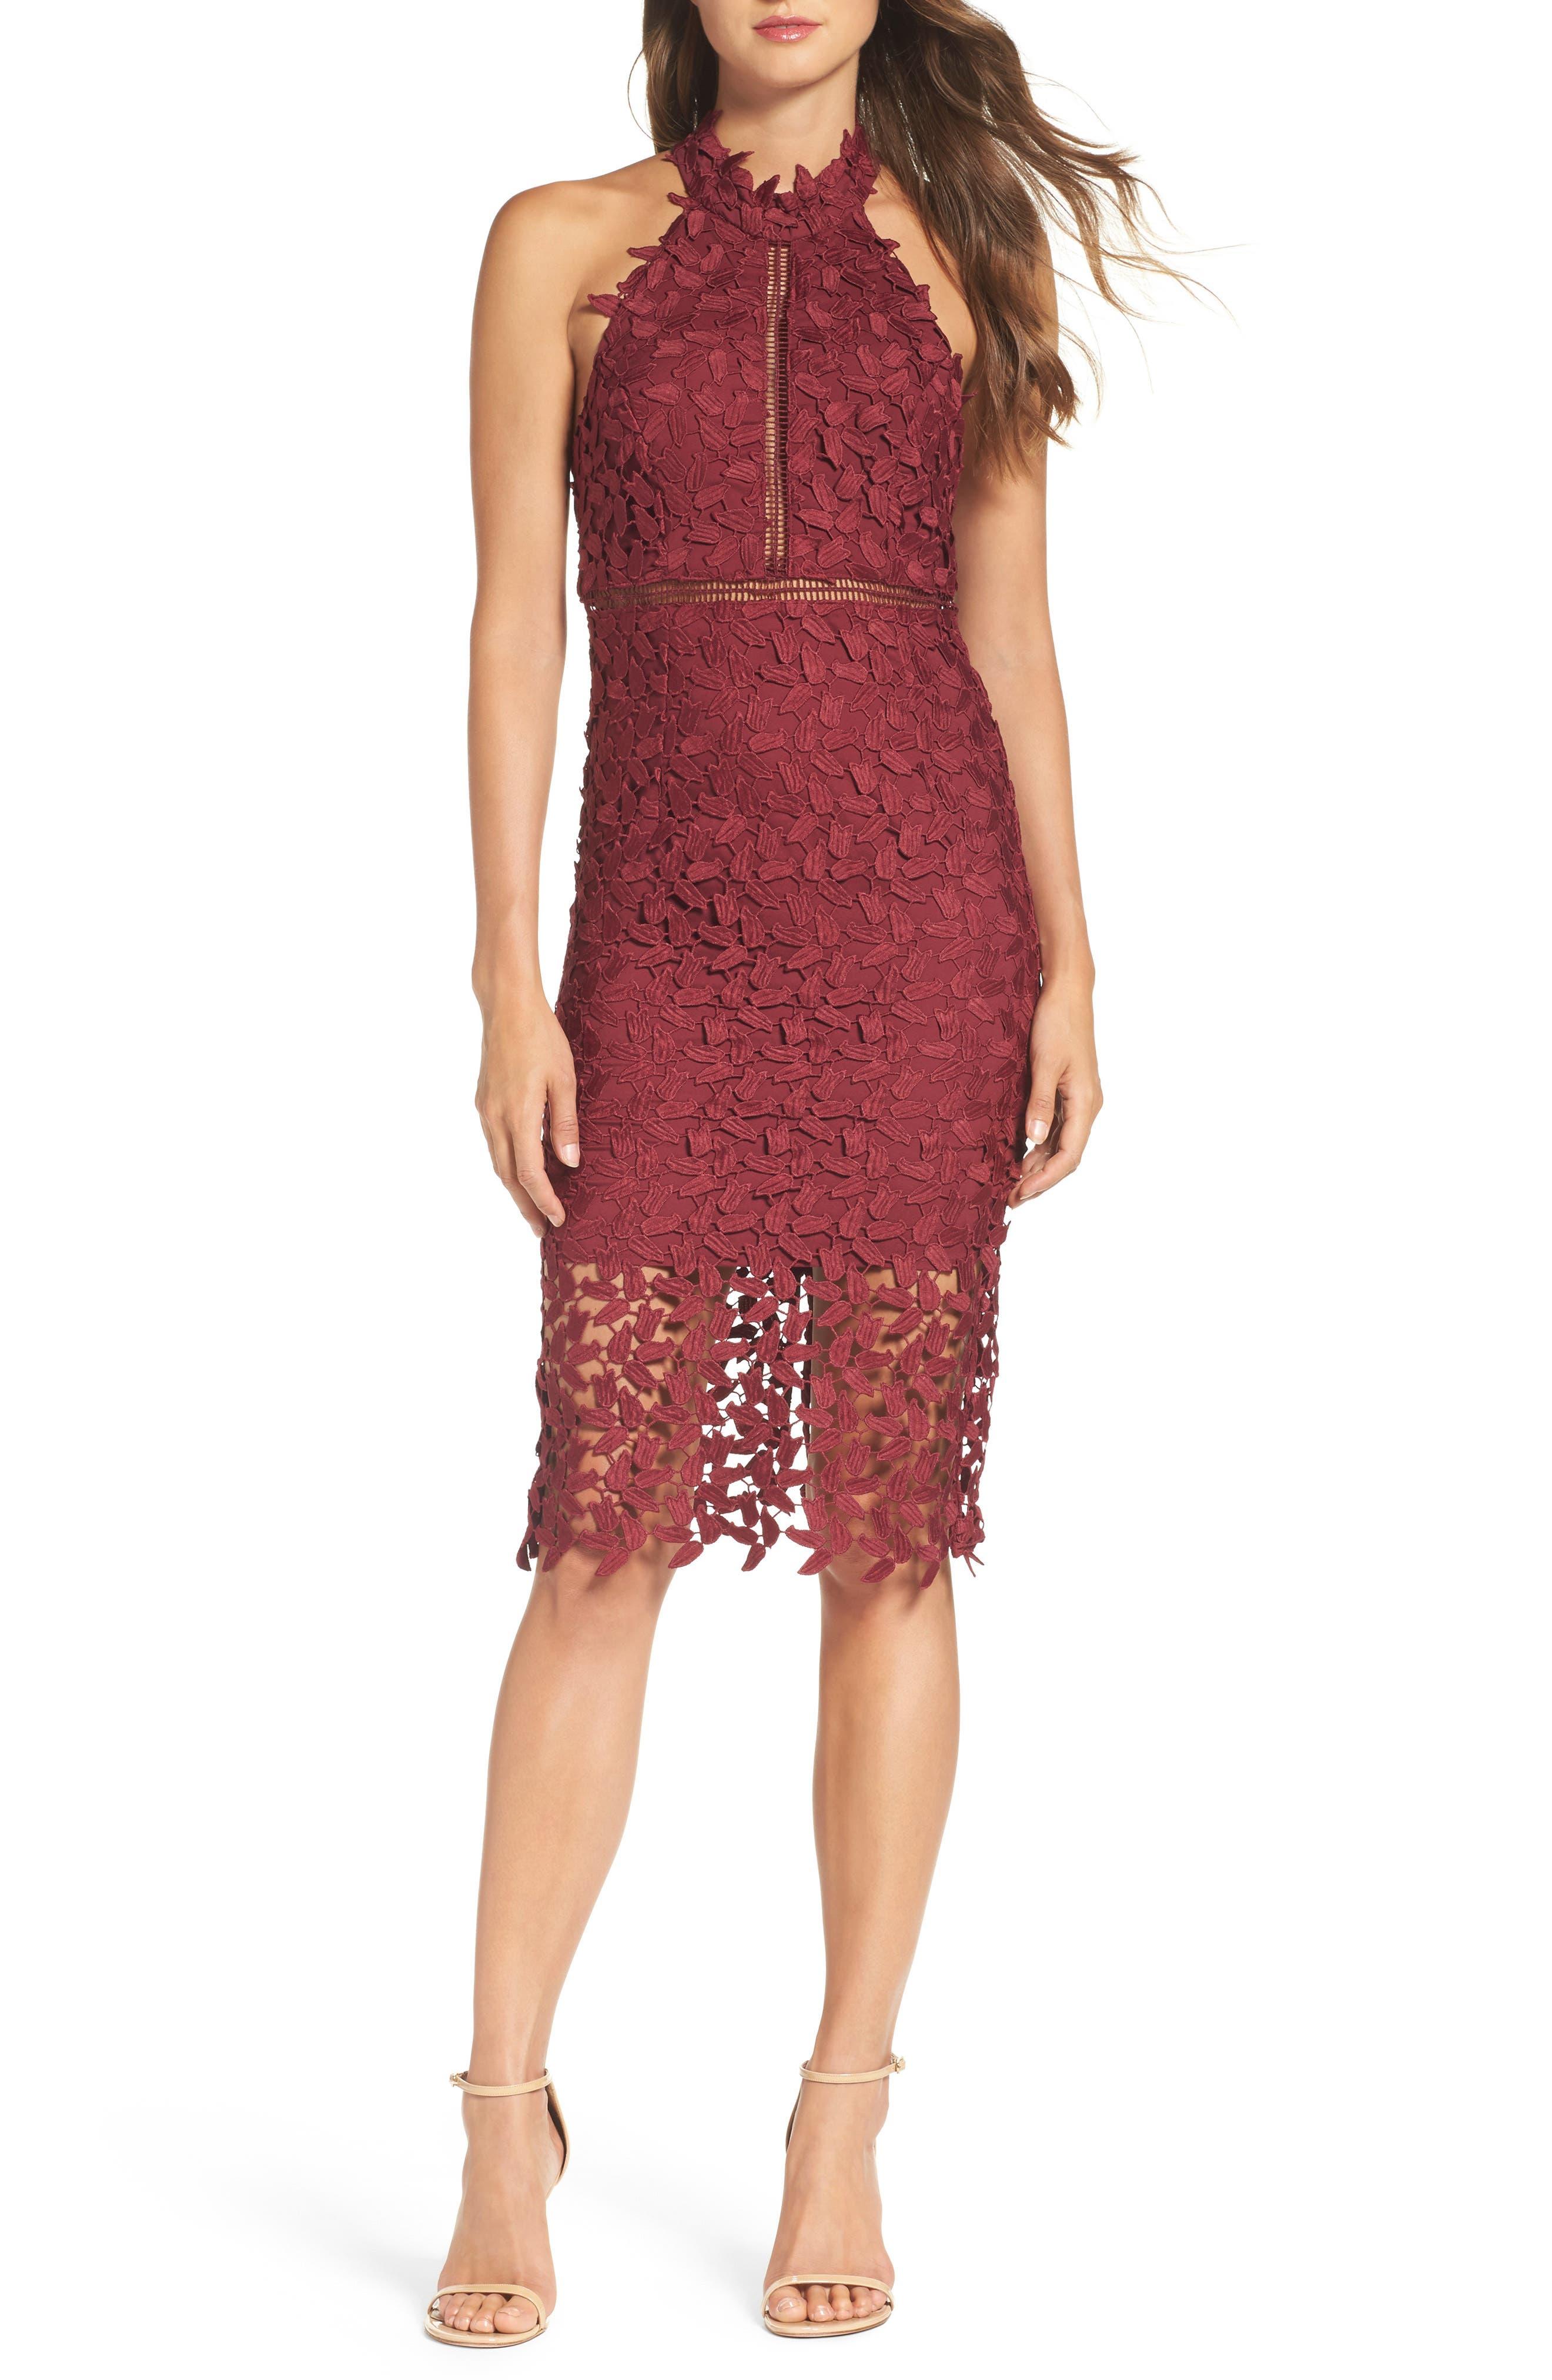 Burgundy lace dress h&m